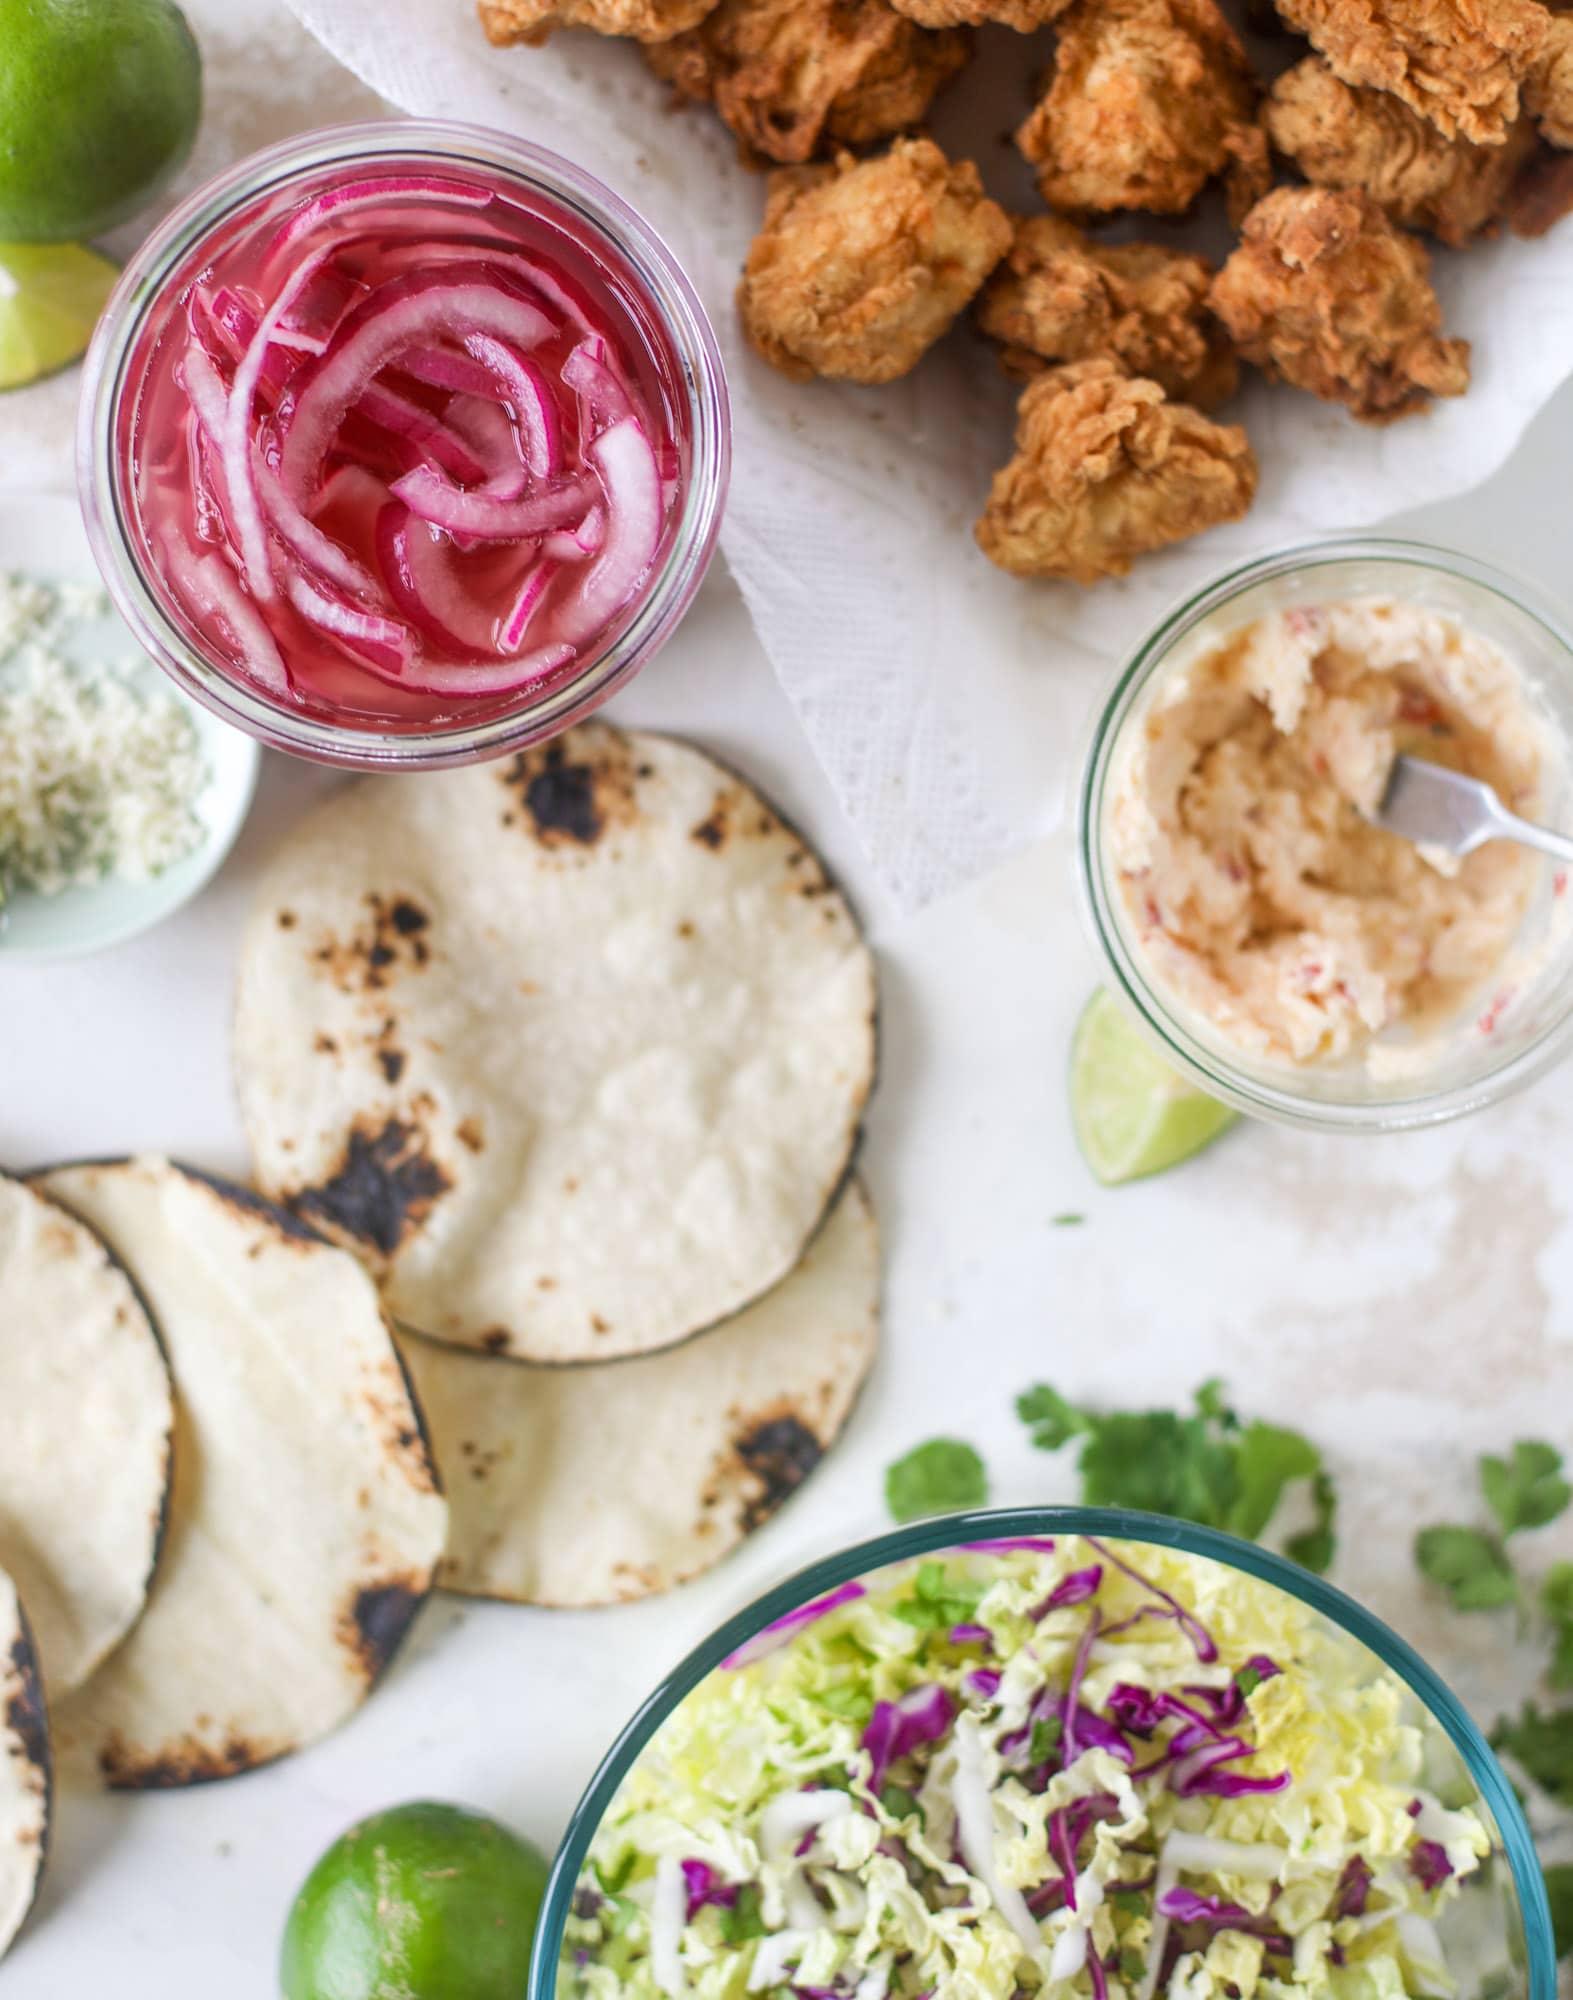 crispy chicken taco ingredients